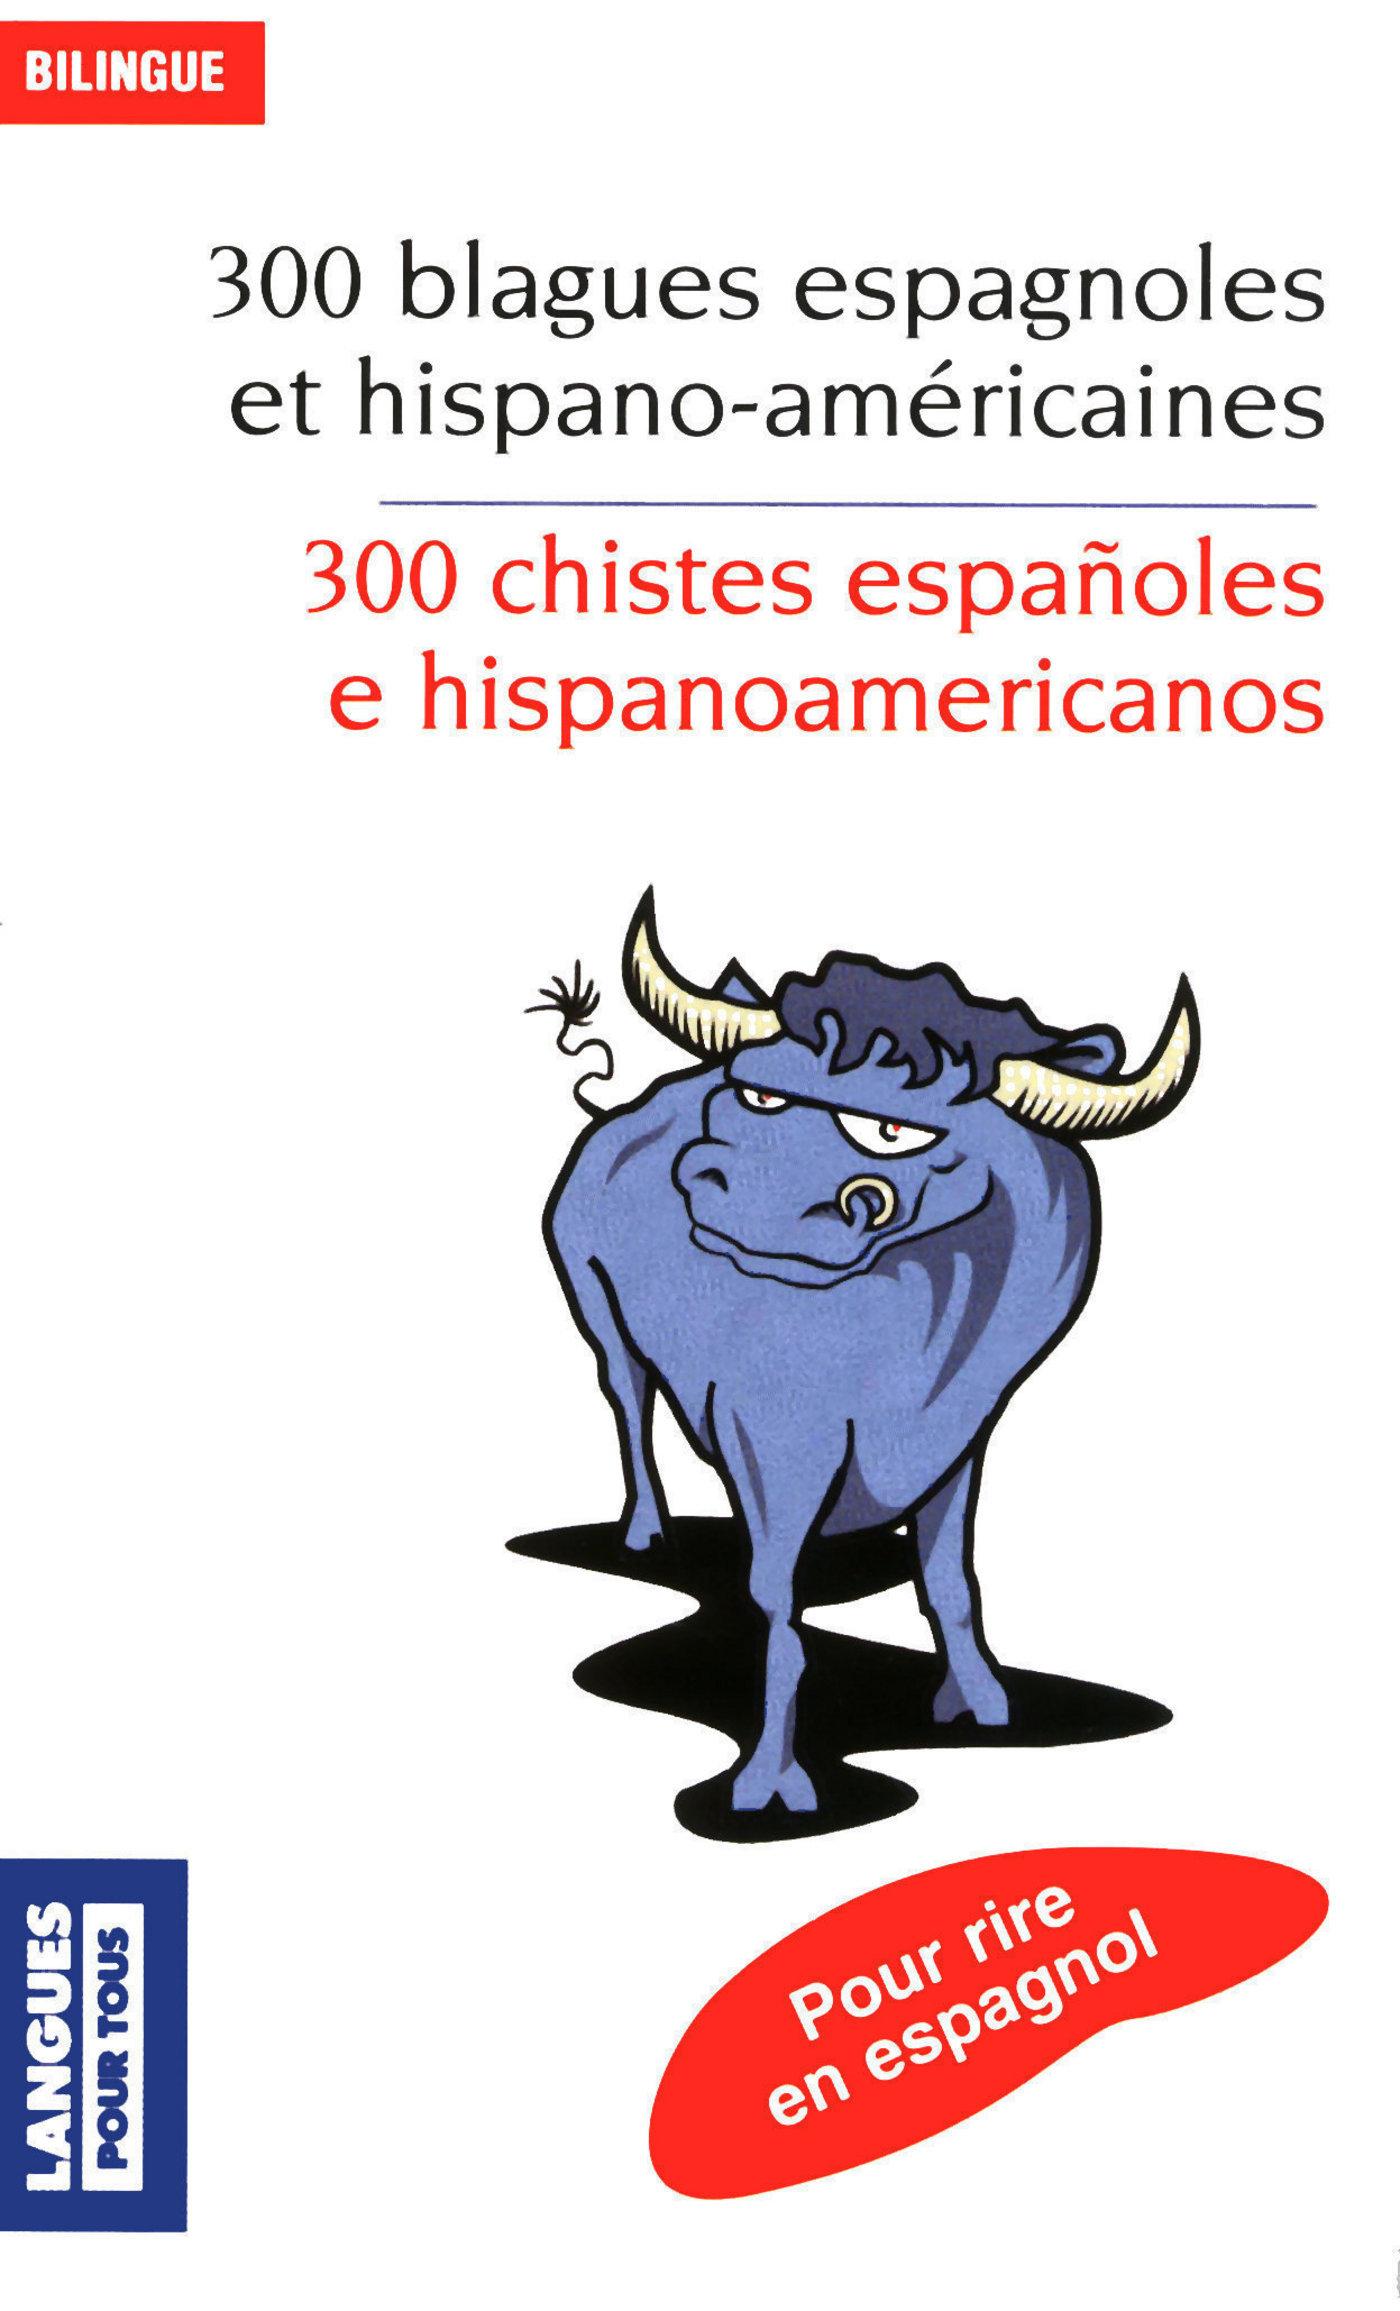 300 blagues espagnoles